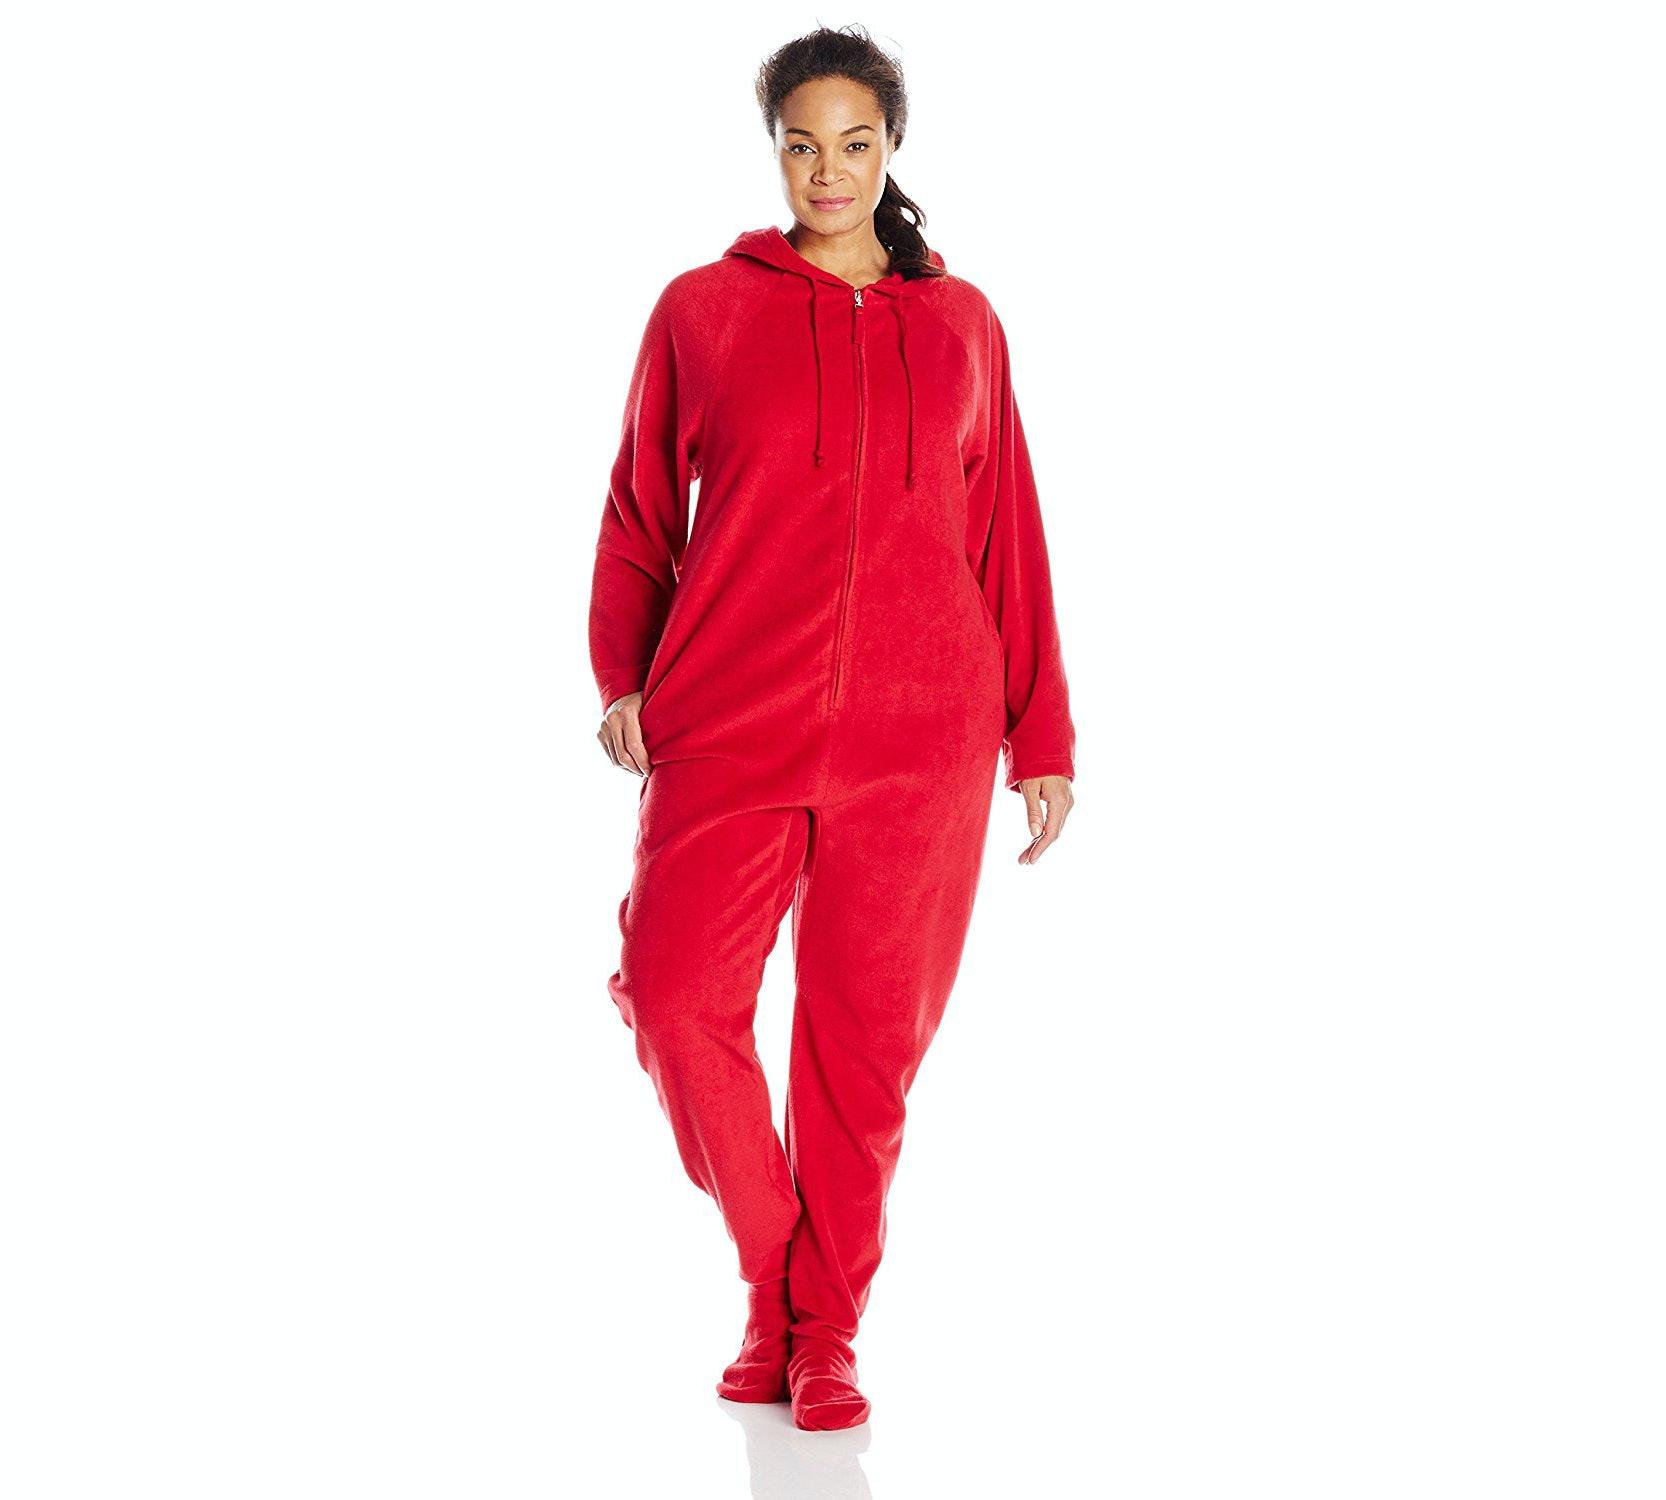 0fea4256c 7 Super Warm Women s Pajamas